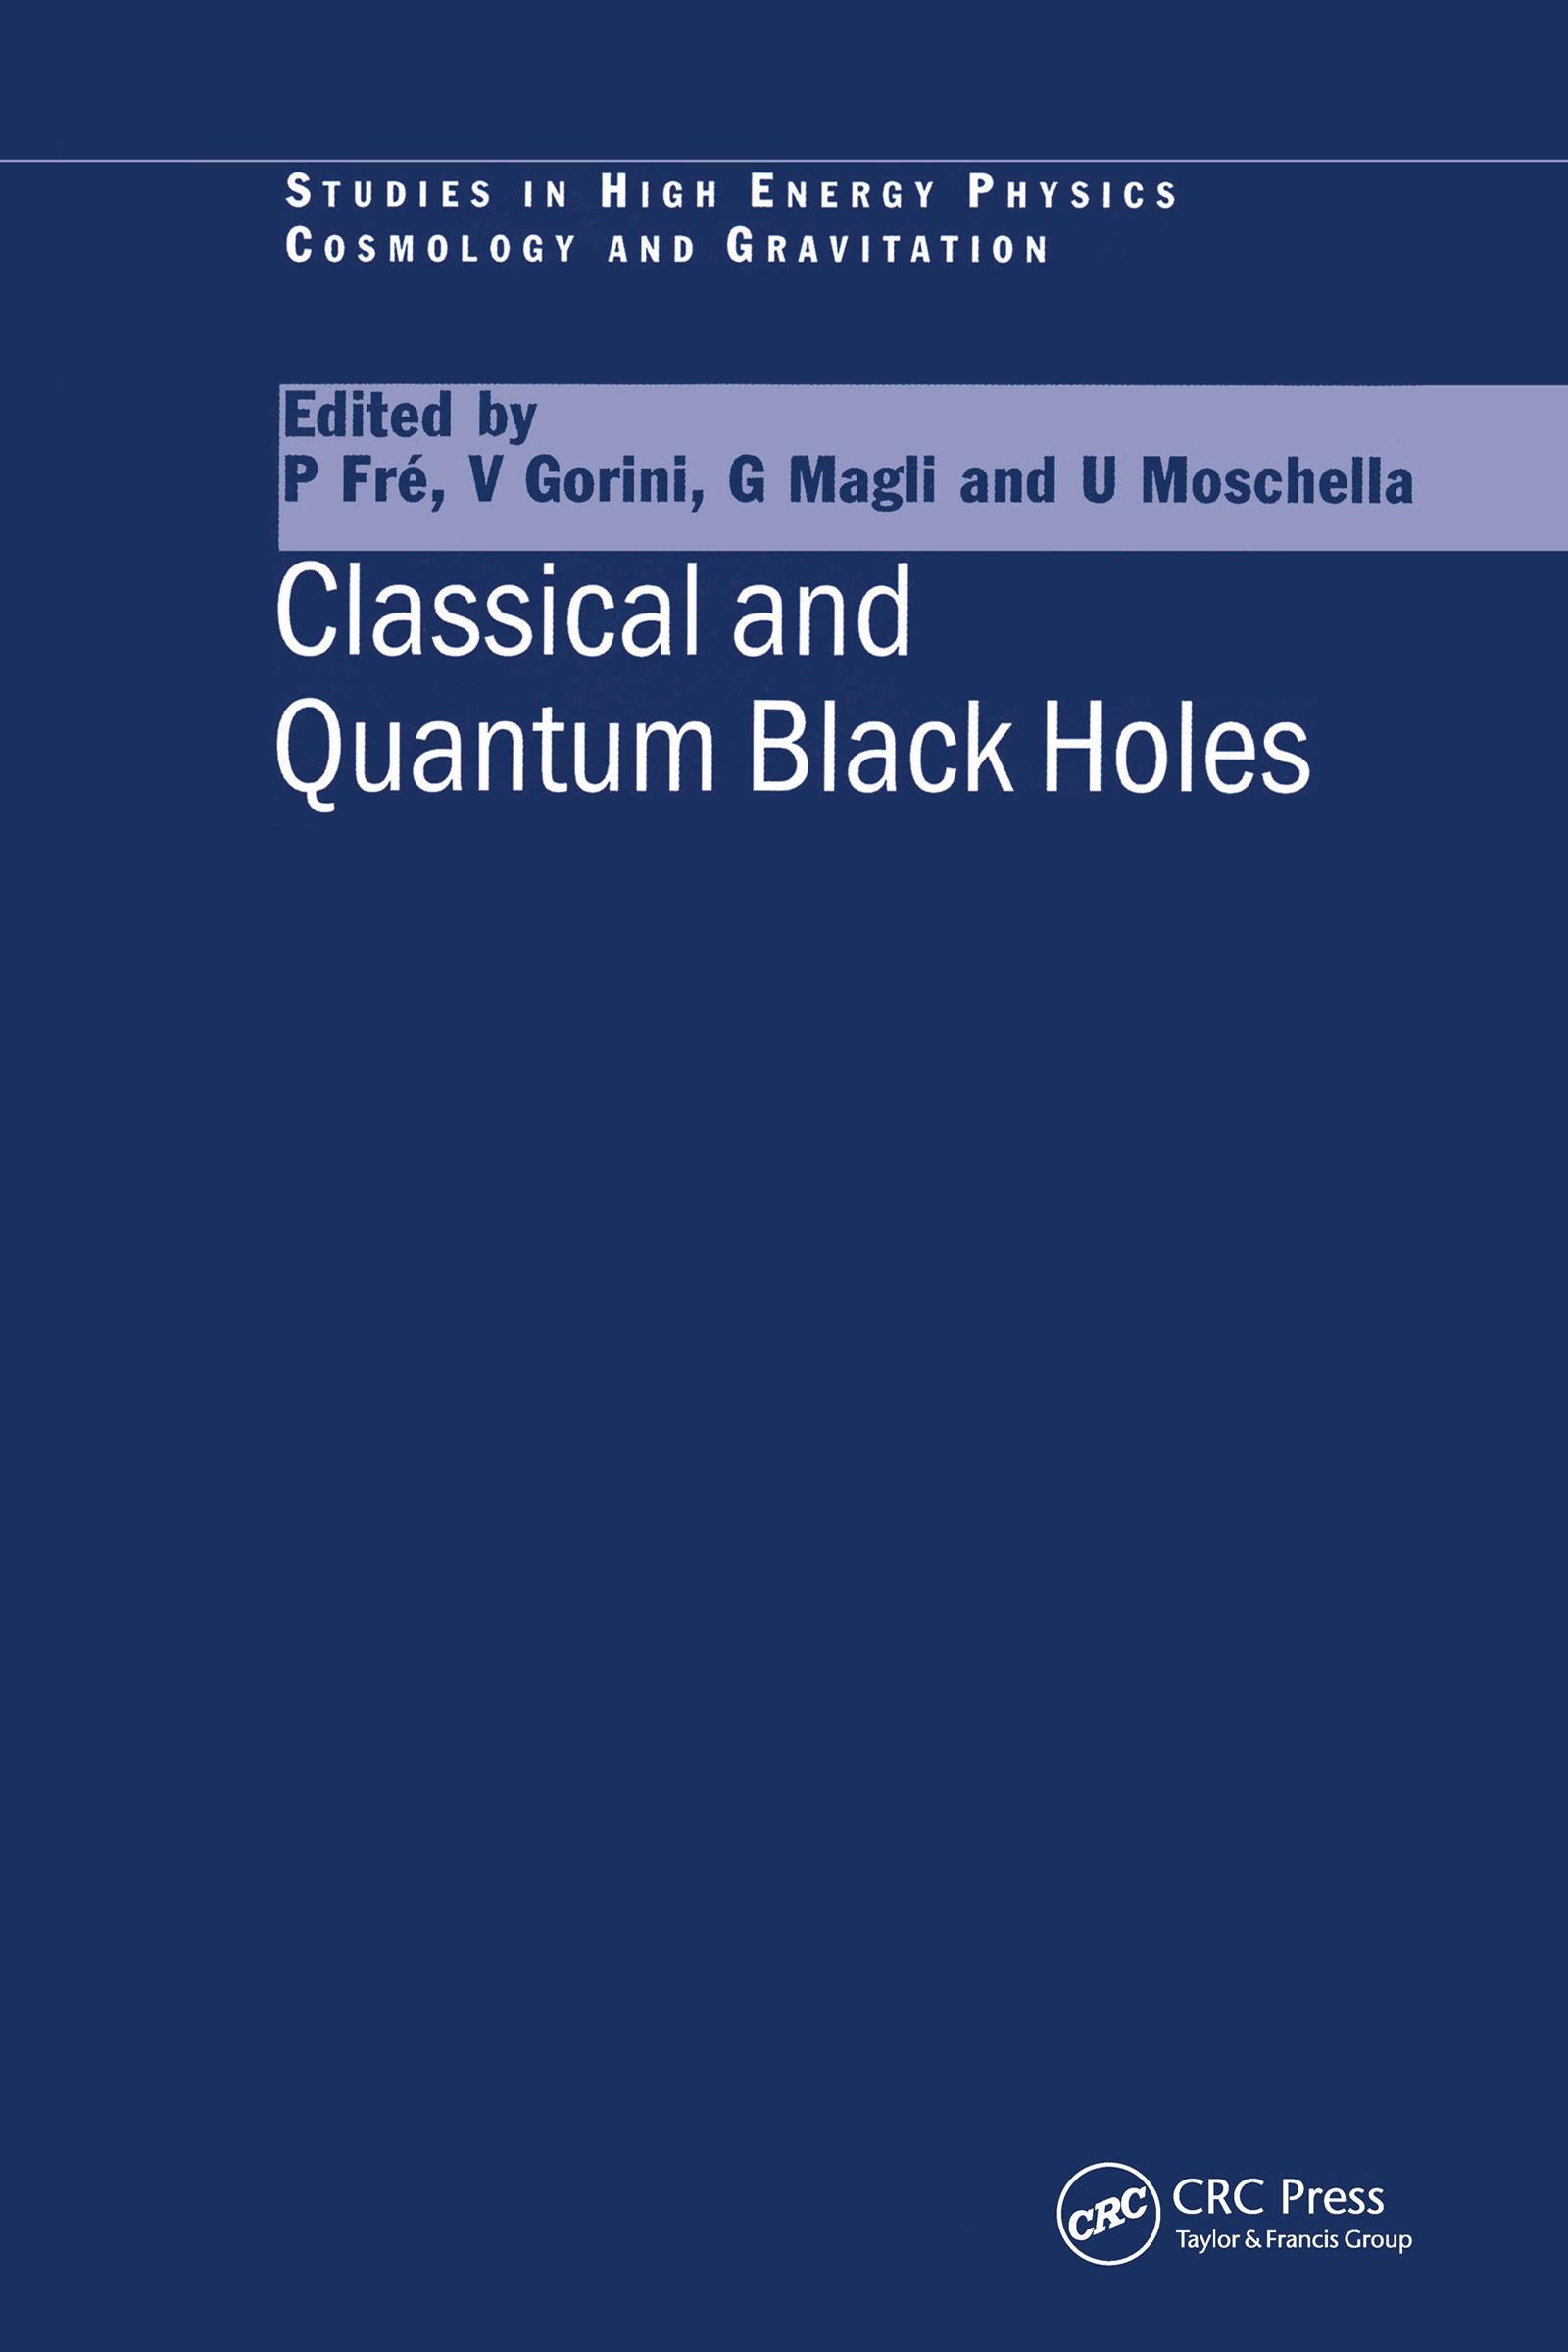 Classical and Quantum Black Holes book cover